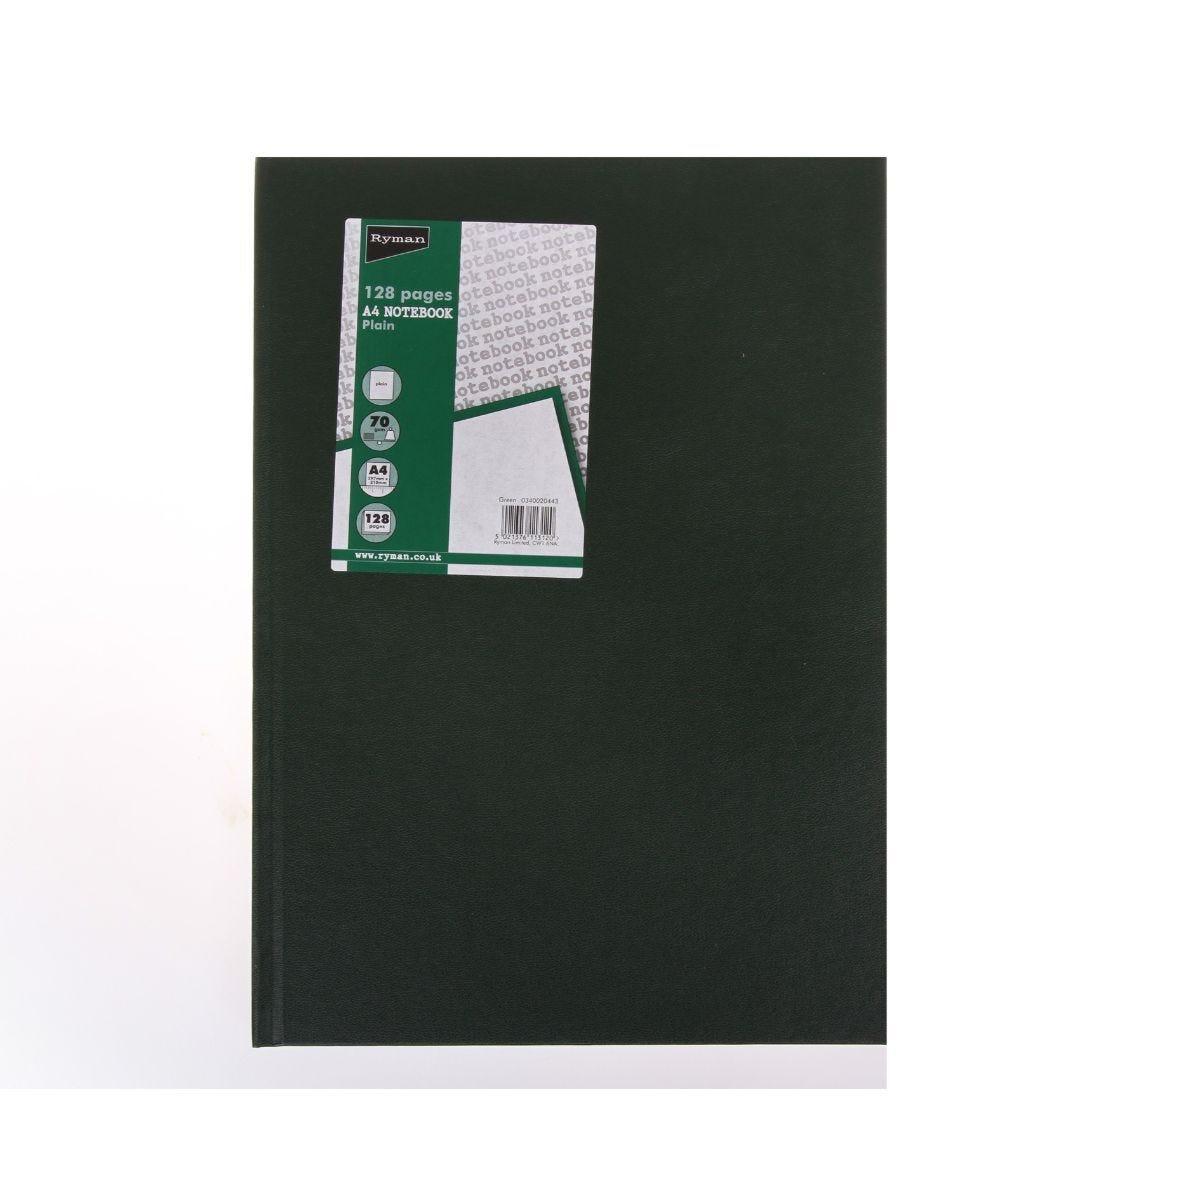 Ryman Casebound Memo Book Plain A4 128 Pages 70gsm